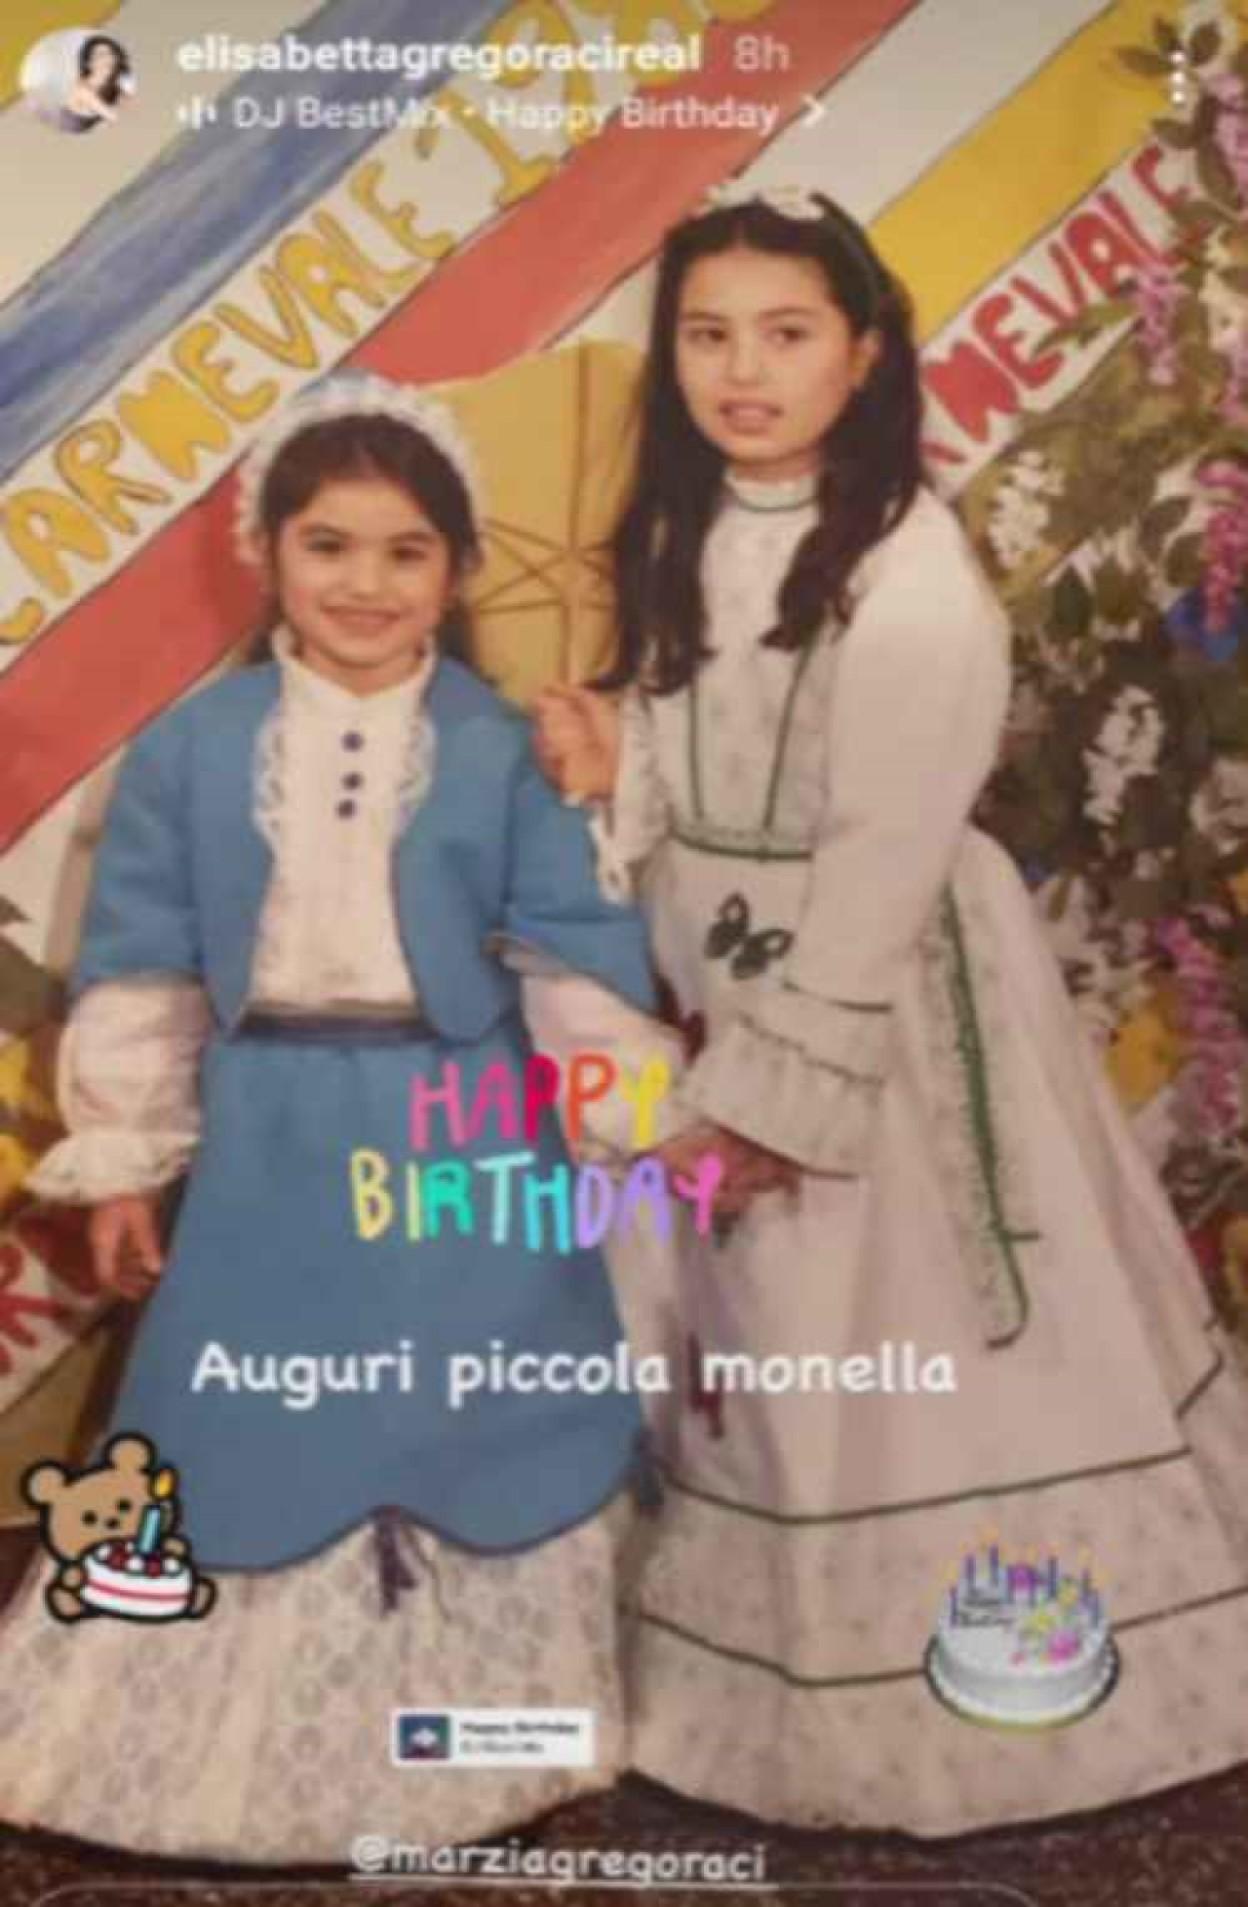 elisabetta gregoraci instagram foto sorella marzia